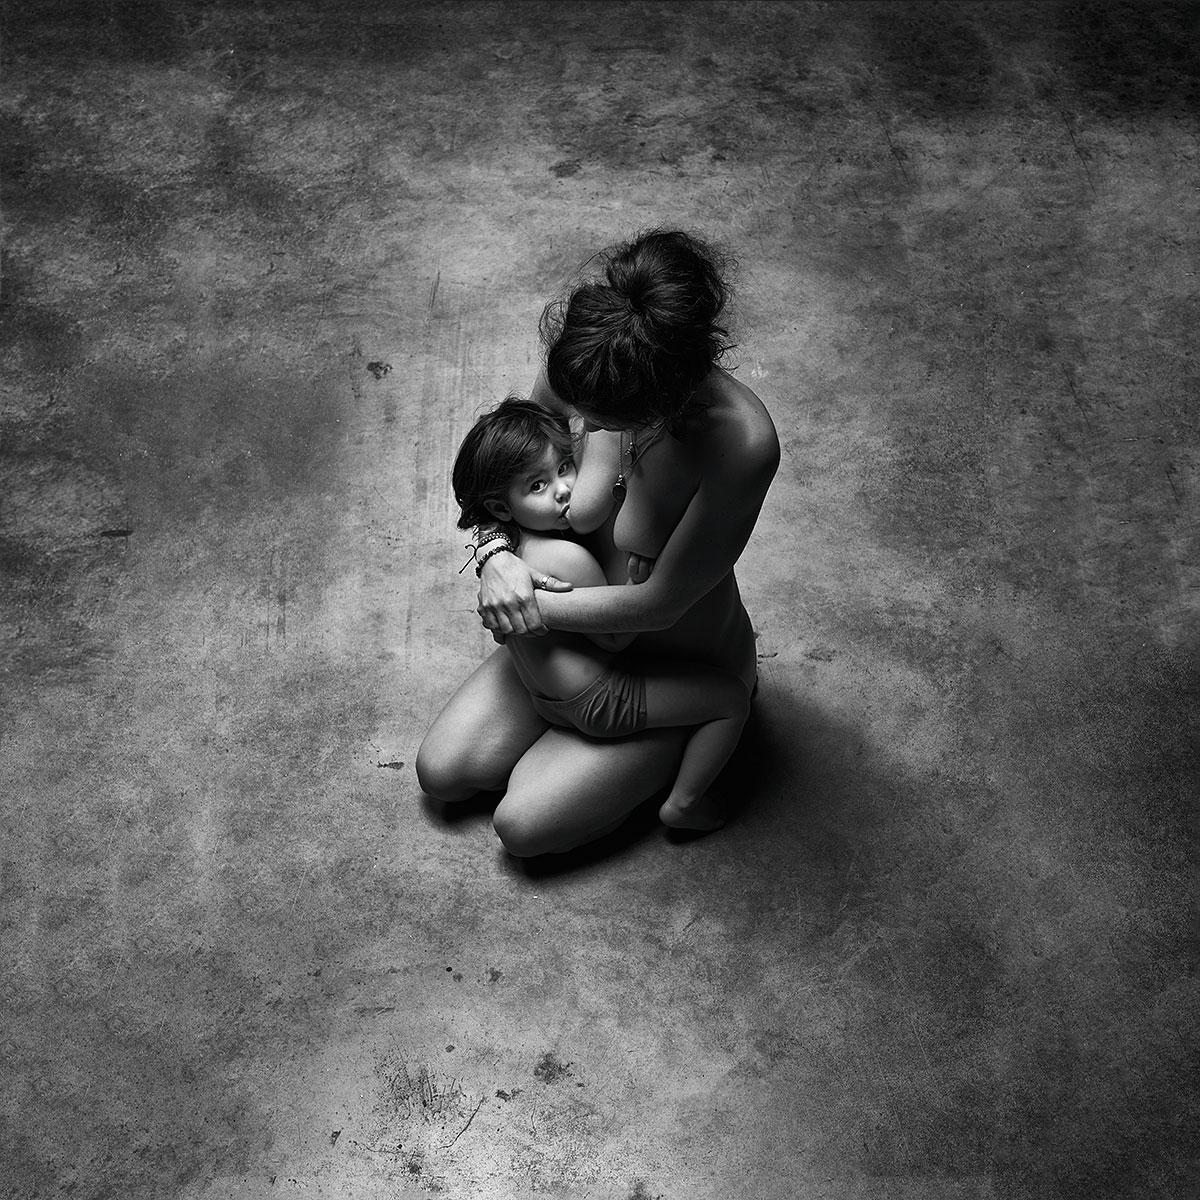 Rhéa ShirUdo photographe maternage proximal en Normandie